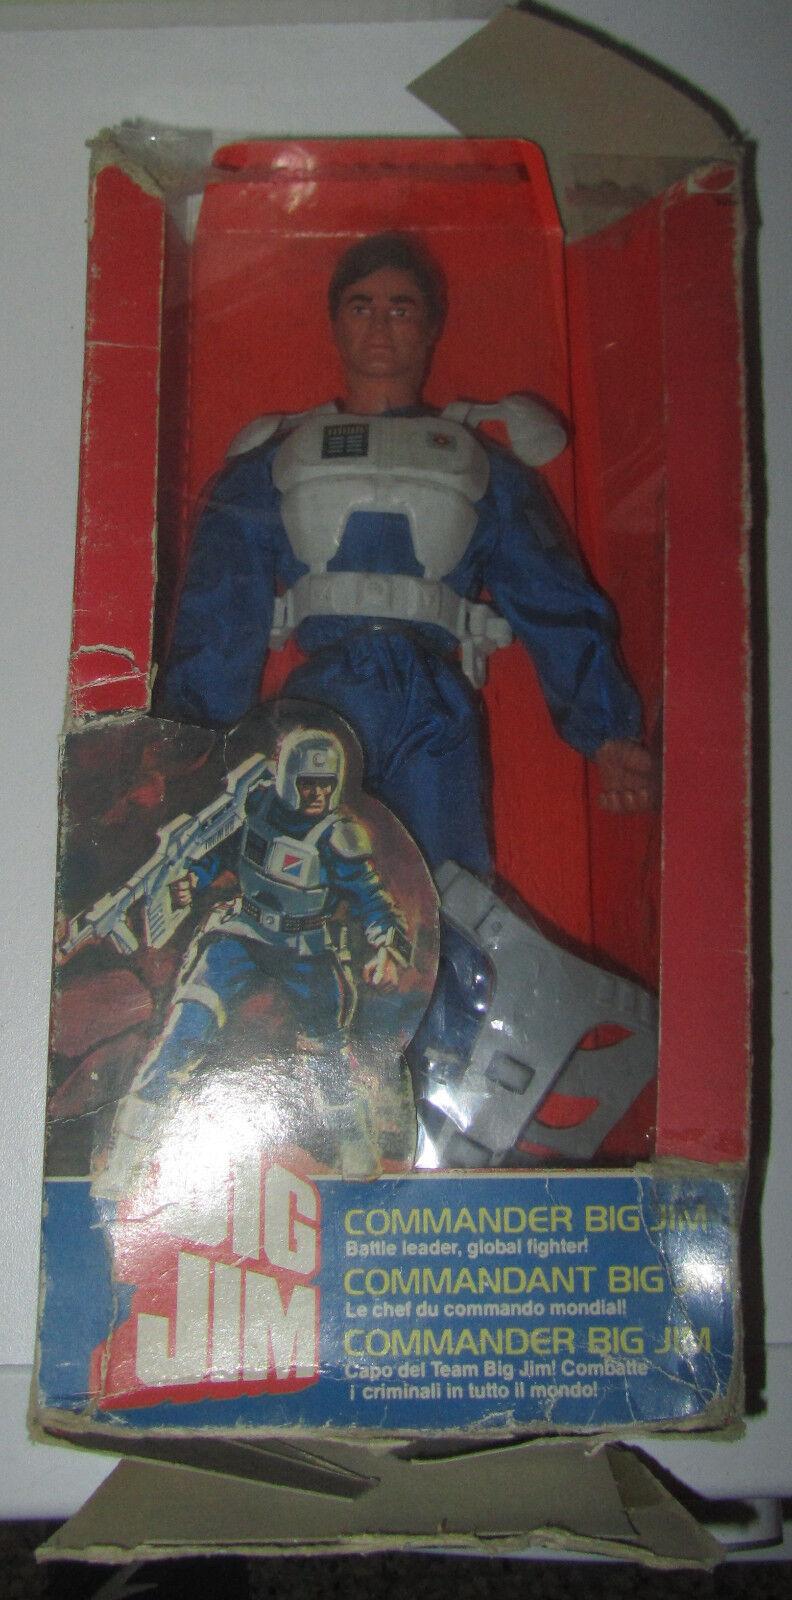 Big Jim Commander 9269 rigido box Rovinato Mattel SPESE GRATIS + Catalogo